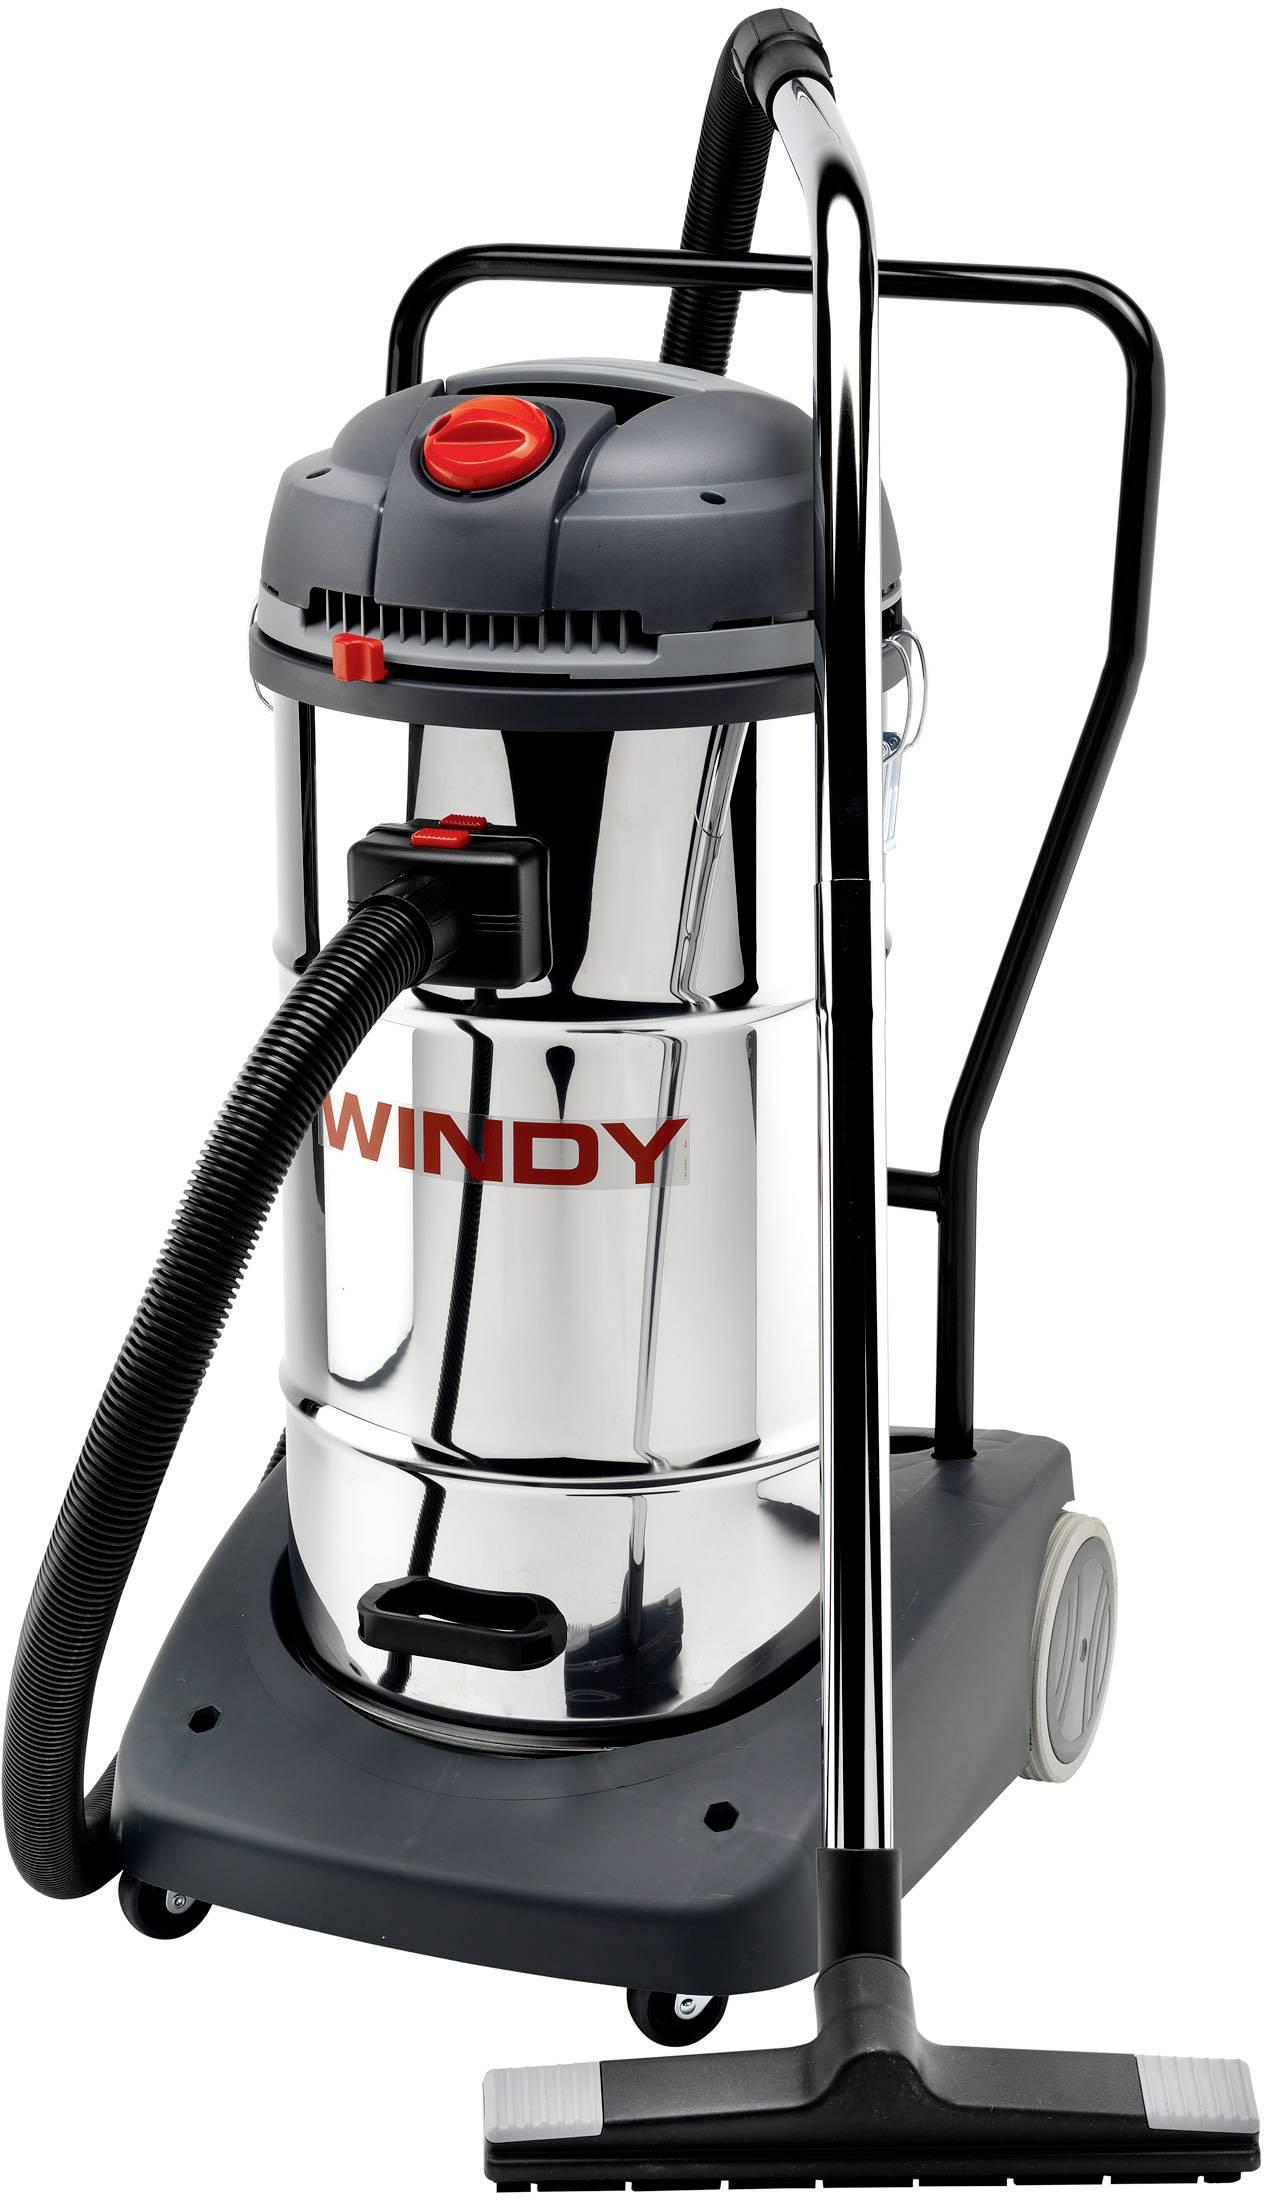 Mokrý / suchý vysávač Lavor Windy 365 IR 8.240.0001, 3600 W, 65 l